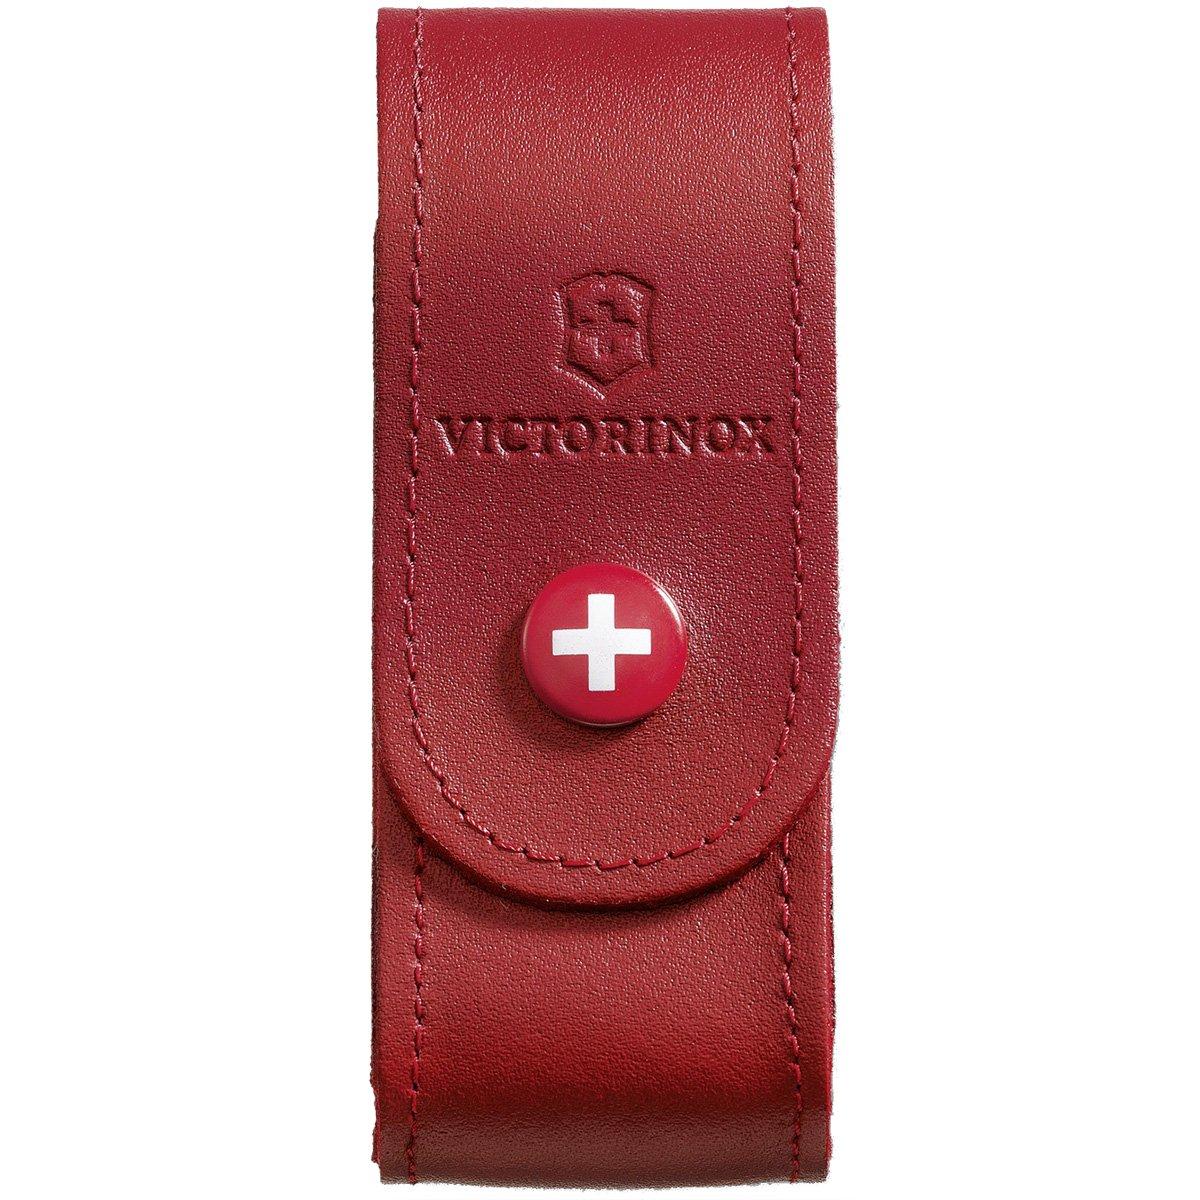 Victorinox Zubehö r Gü rteletui Leder rot Mantel LISYY #Victorinox 4052010